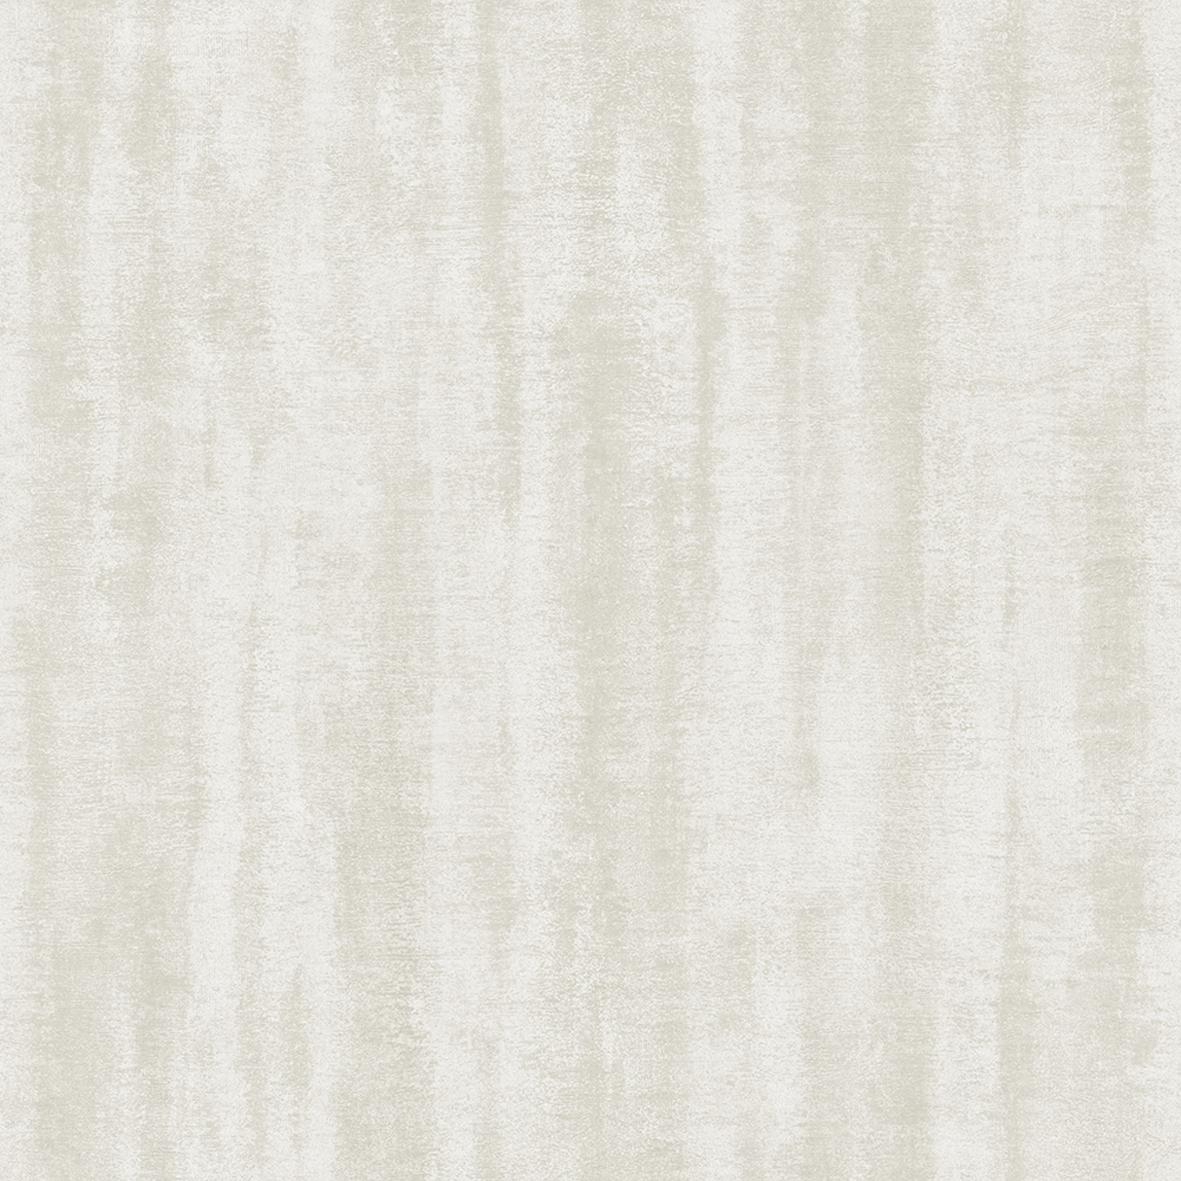 130401 Lauretta Ivory Plain